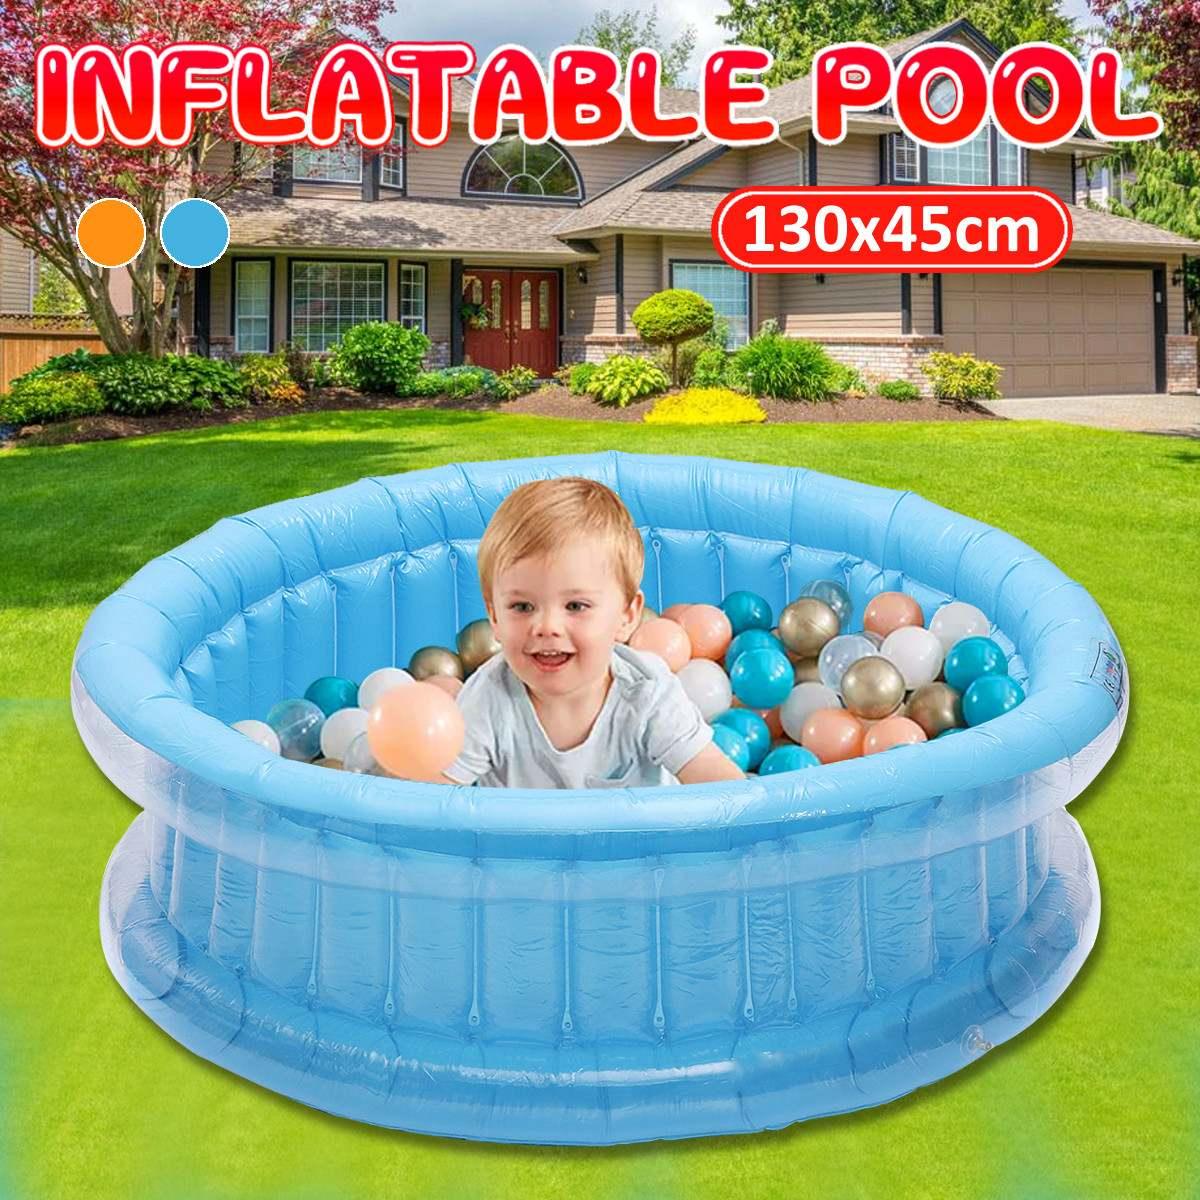 Piscina redonda inflable para niños pequeños de 130cm, piscina de PVC, PISCINA DE BOLAS, piscina de exterior, juego de agua para niños de 0 a 3 años Antena telescópica de largo alcance extensible de 130cm para GPS portátil garmin astro 320 astro 220 astro 430